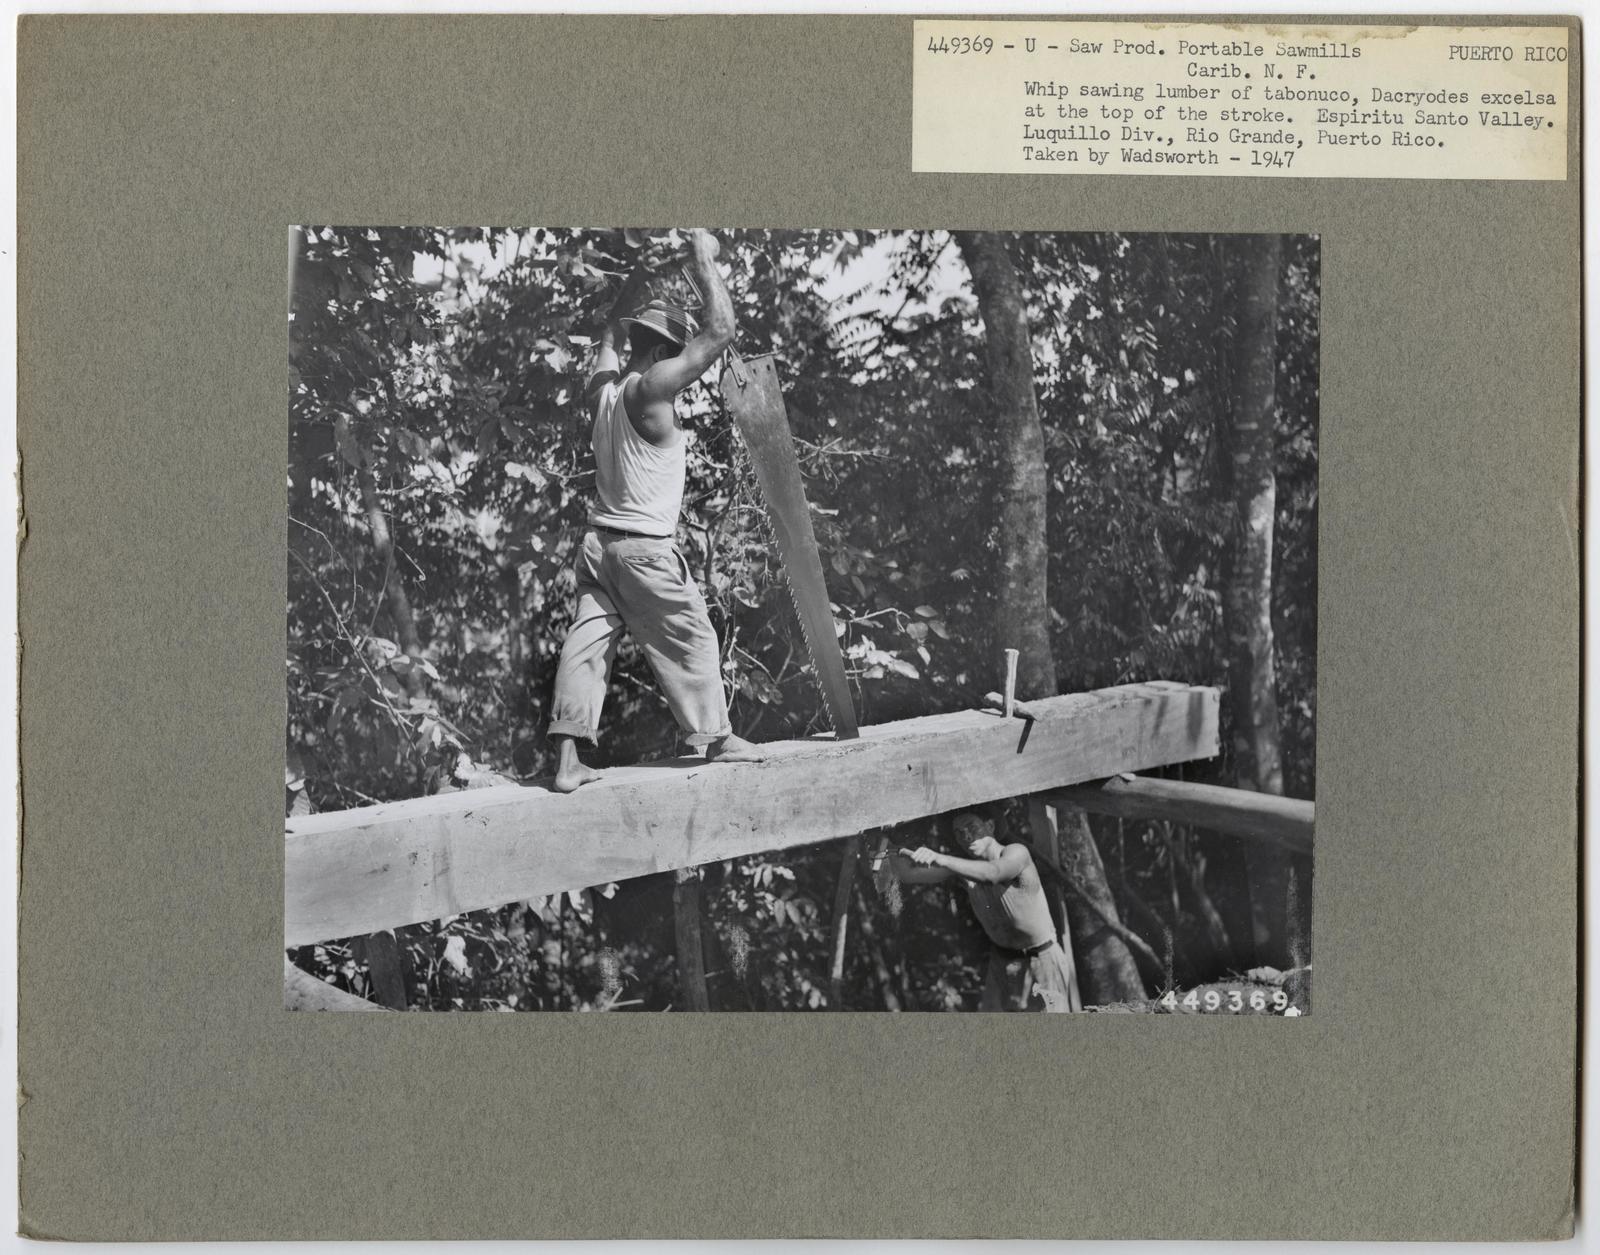 Large Sawmills - Puerto Rico